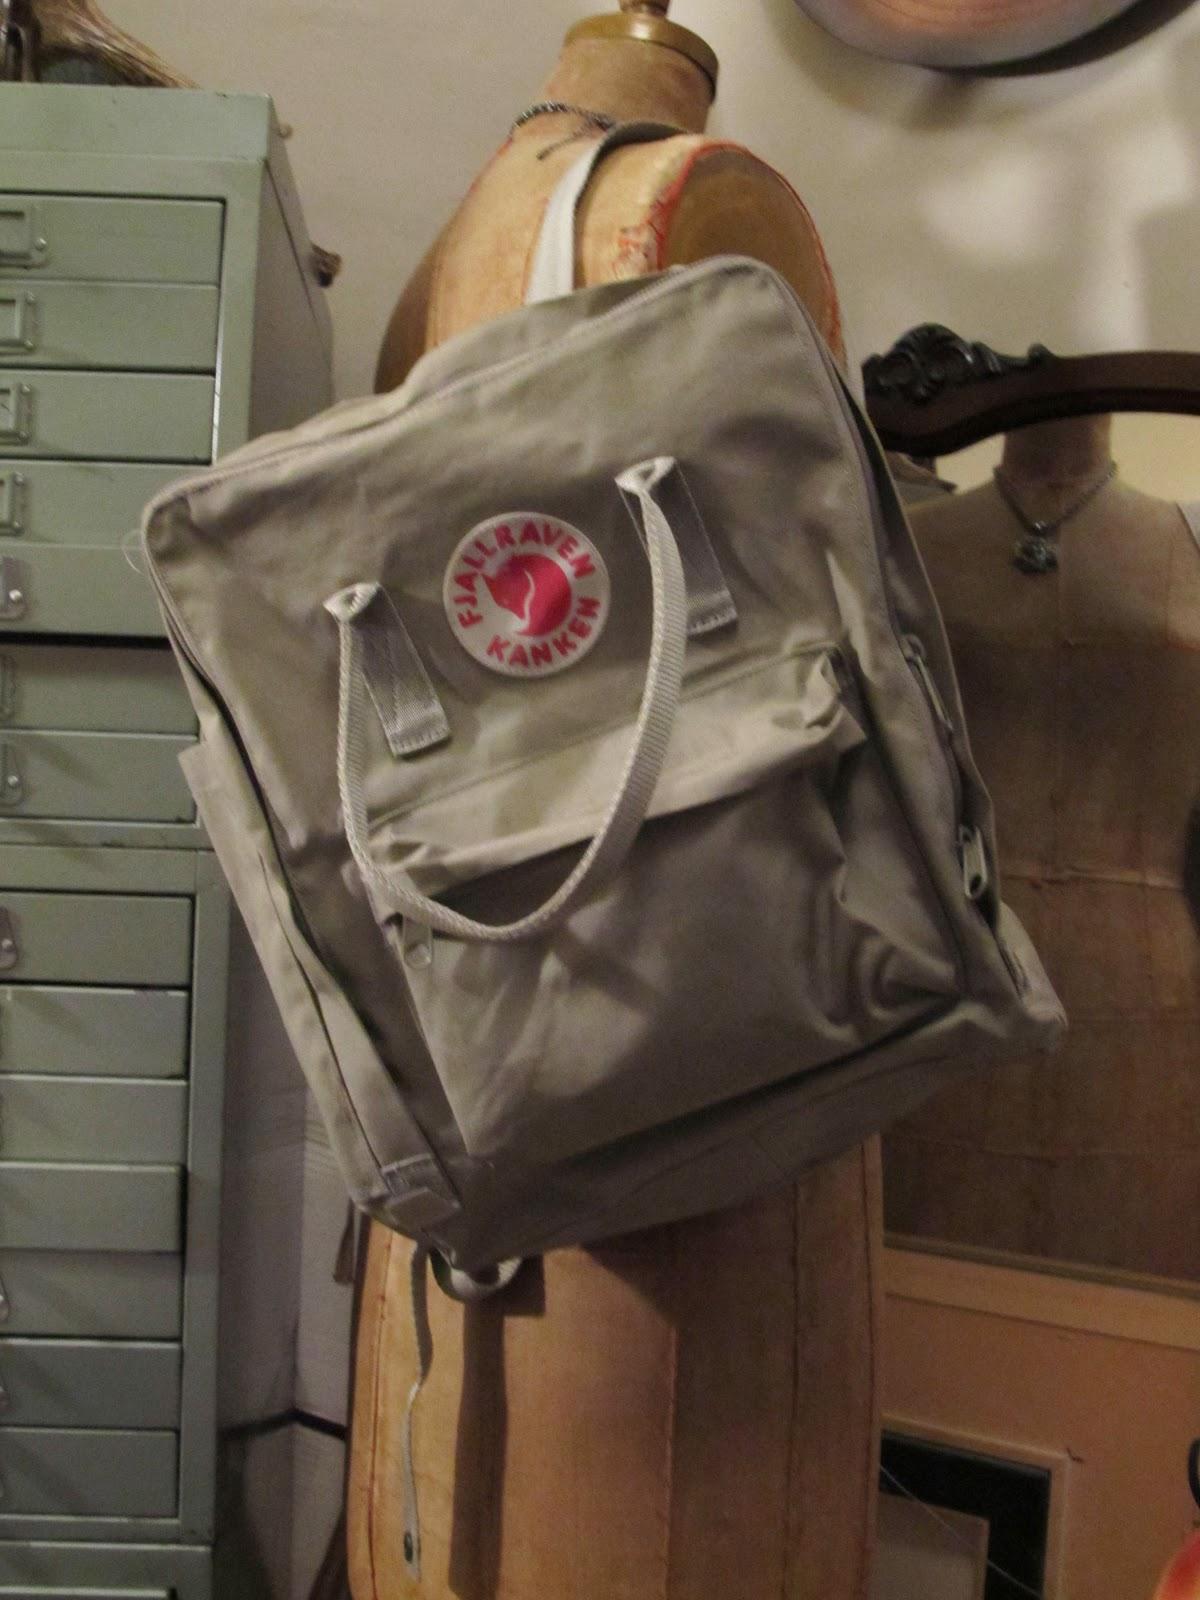 Nordiska Style Fj 228 Llr 228 Ven Kanken Backpack A Swedish Classic